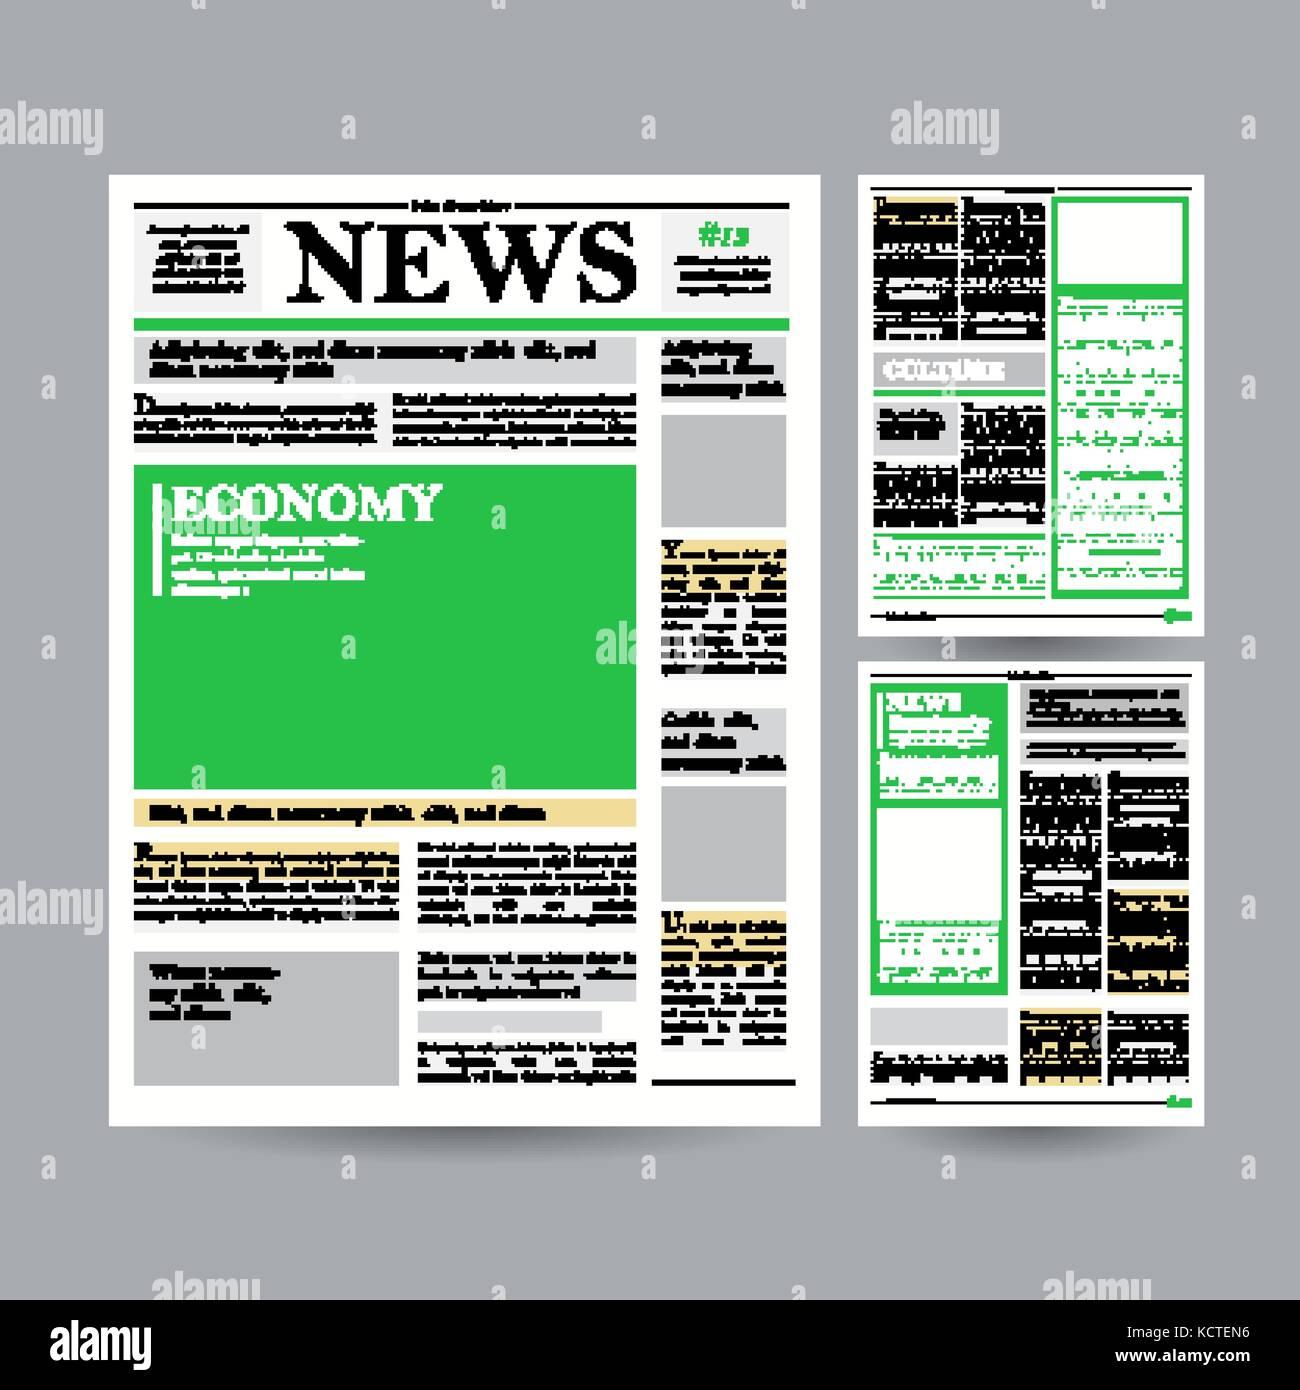 Newspaper design template vector financial articles advertising newspaper design template vector financial articles advertising business information world news economy headlines blank spaces for images saigontimesfo